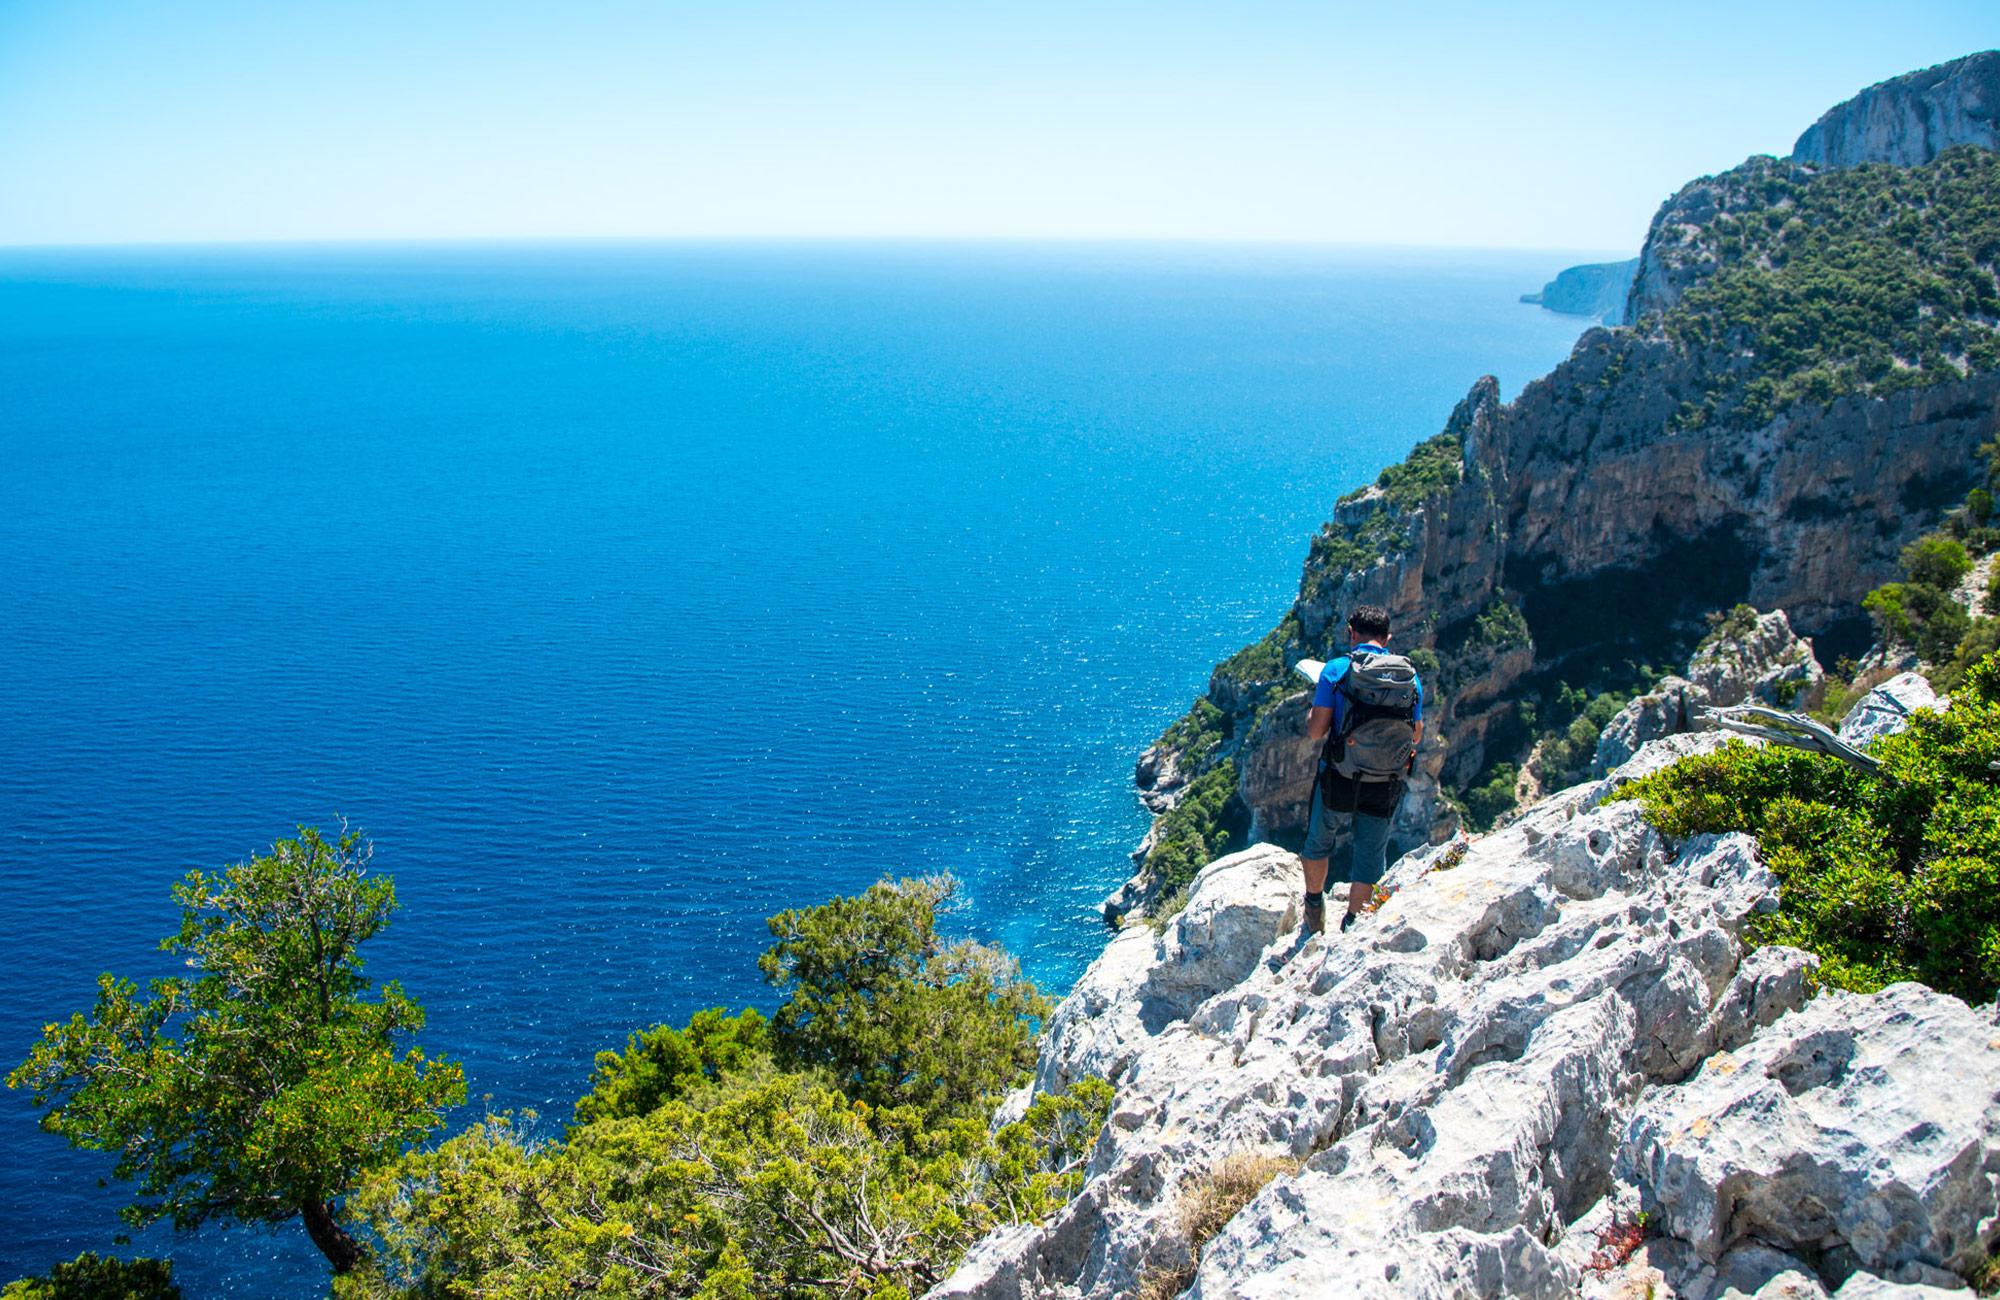 High school hiking trip on Moondance in Sardinia